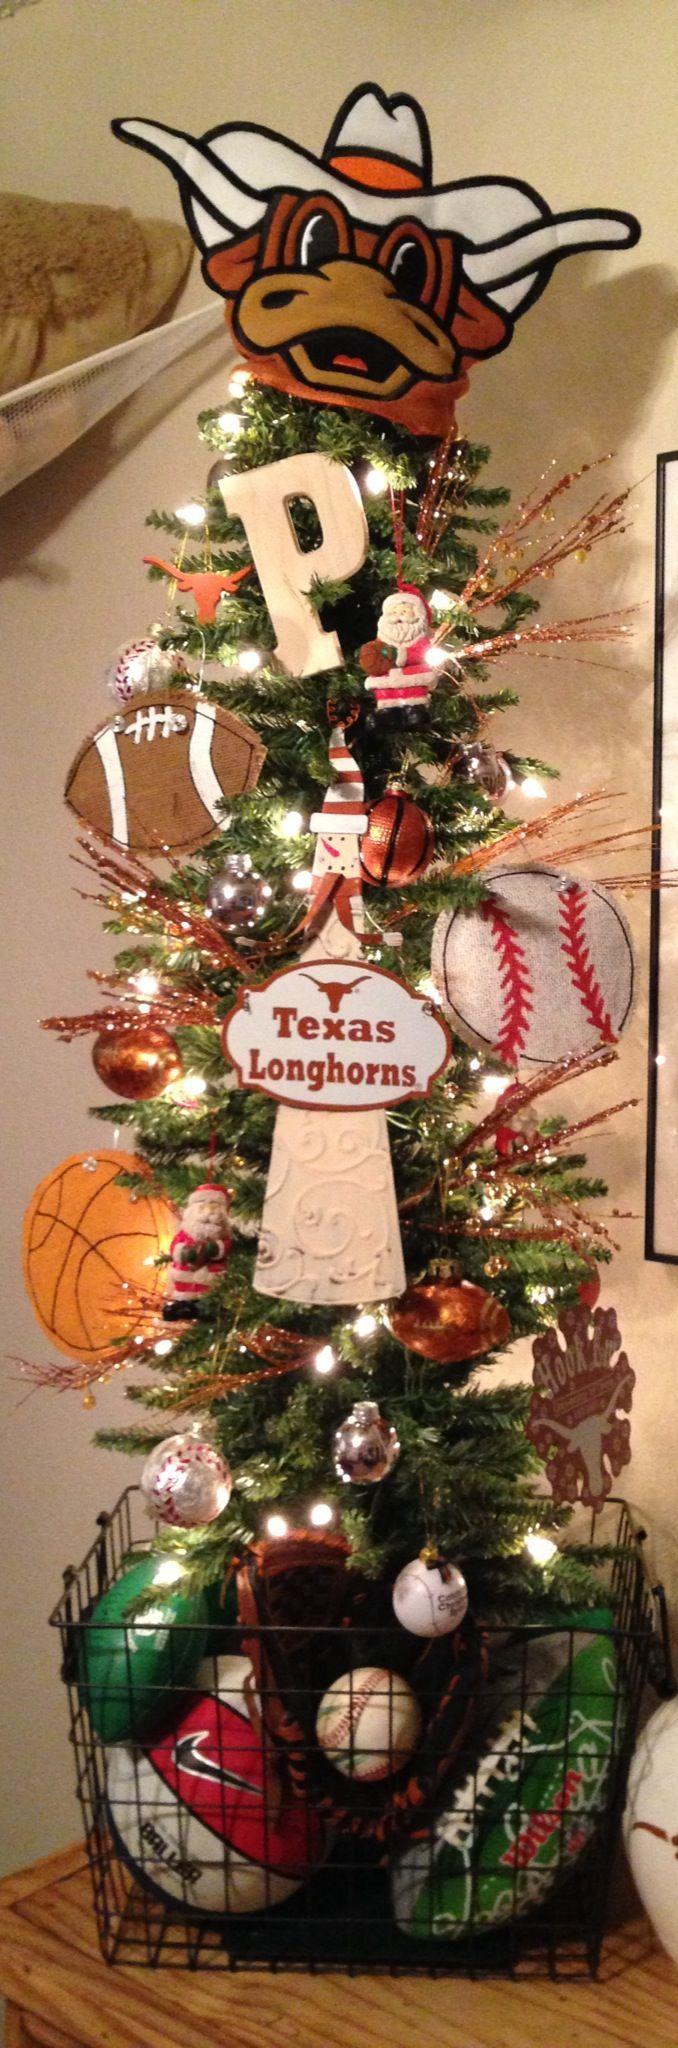 Texas Longhorns Sports Themed Christmas Tree Me